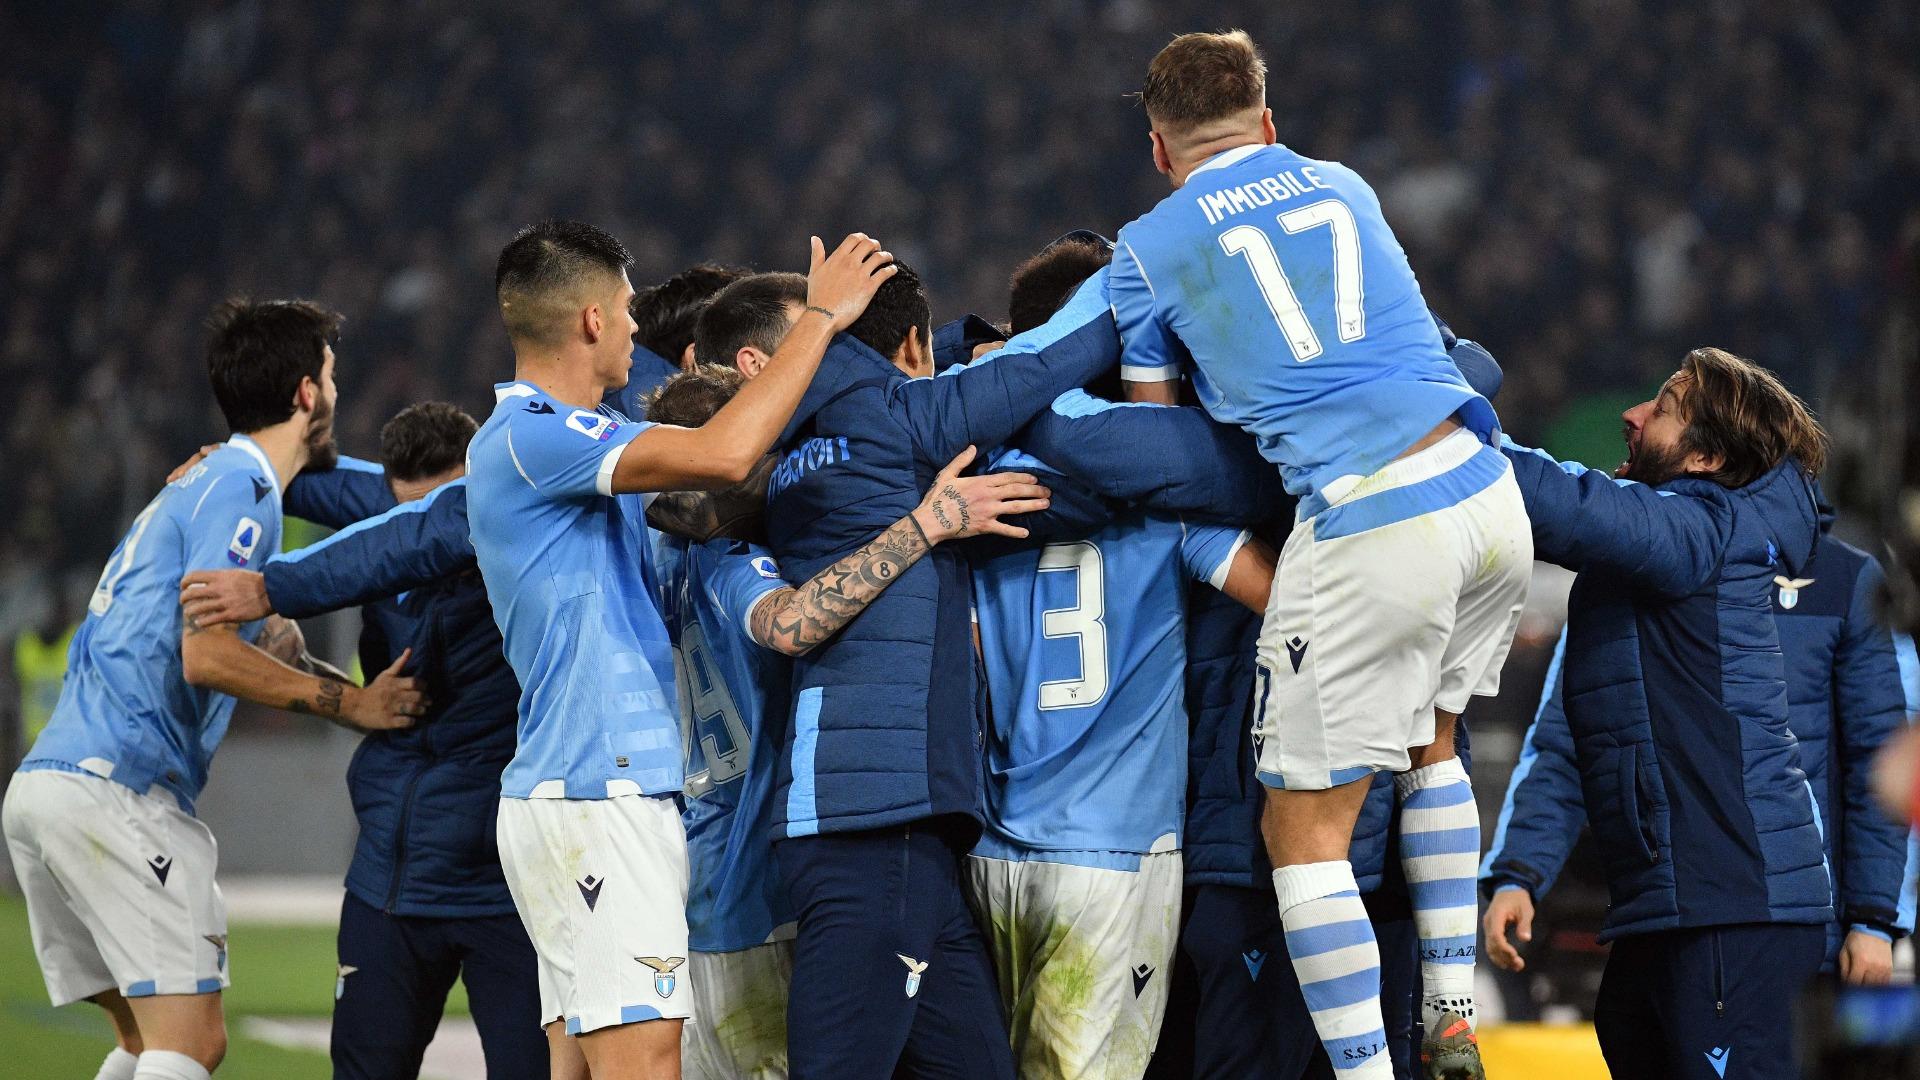 Lazio 3-1 Juventus: Sarri suffers first defeat with Bianconeri